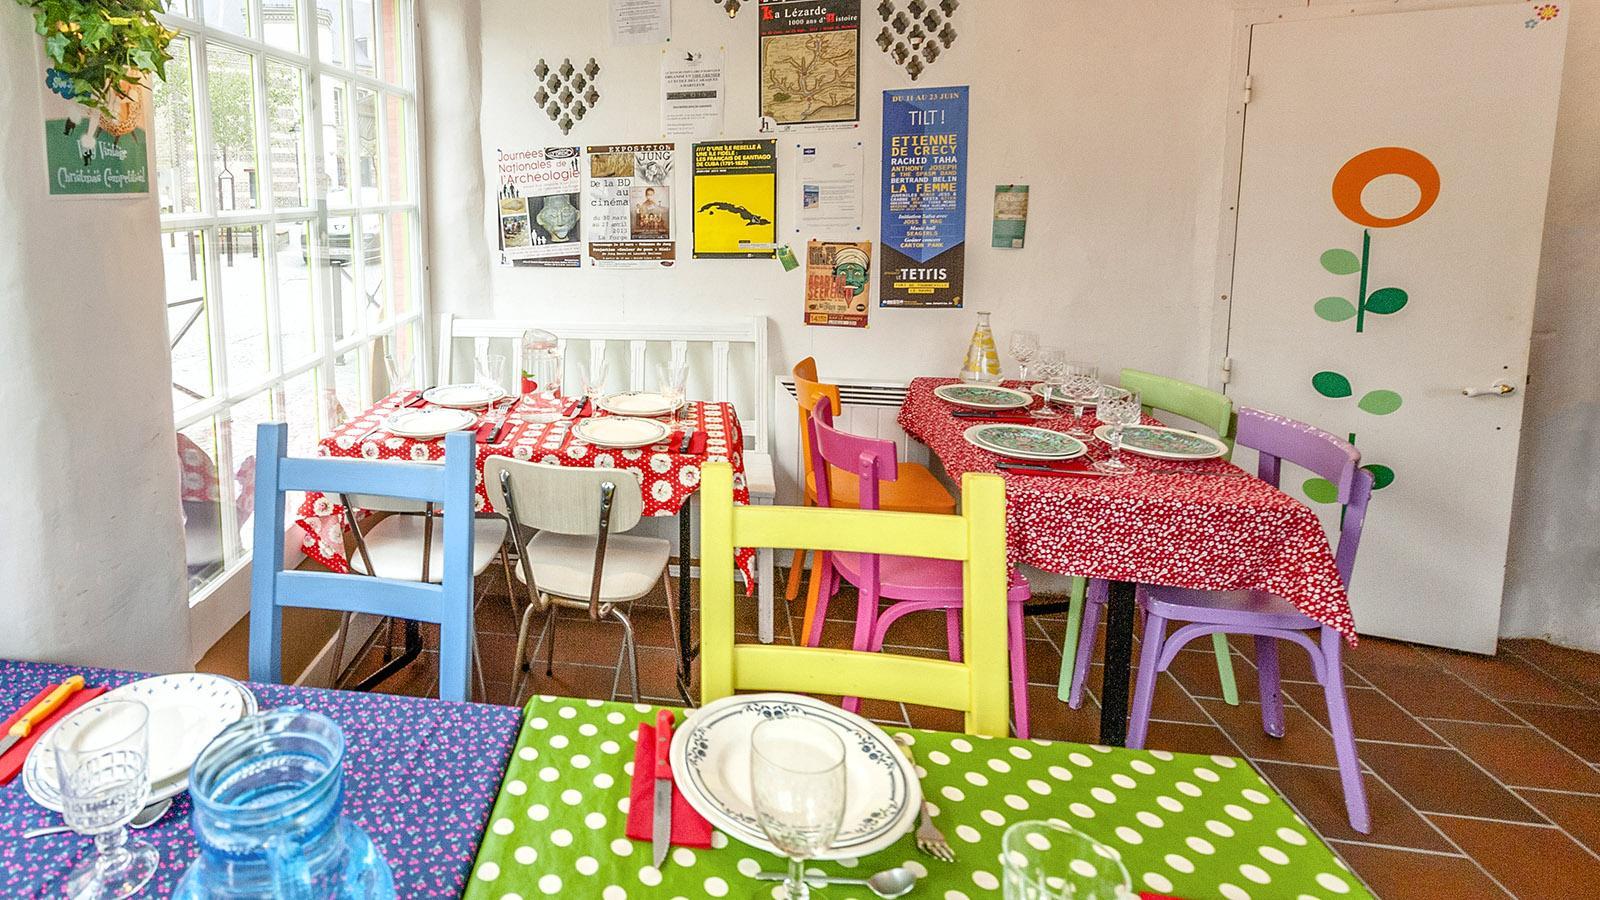 La Cantine, Restaurant associatif in Harfleur. Foto: Hilke Maunder